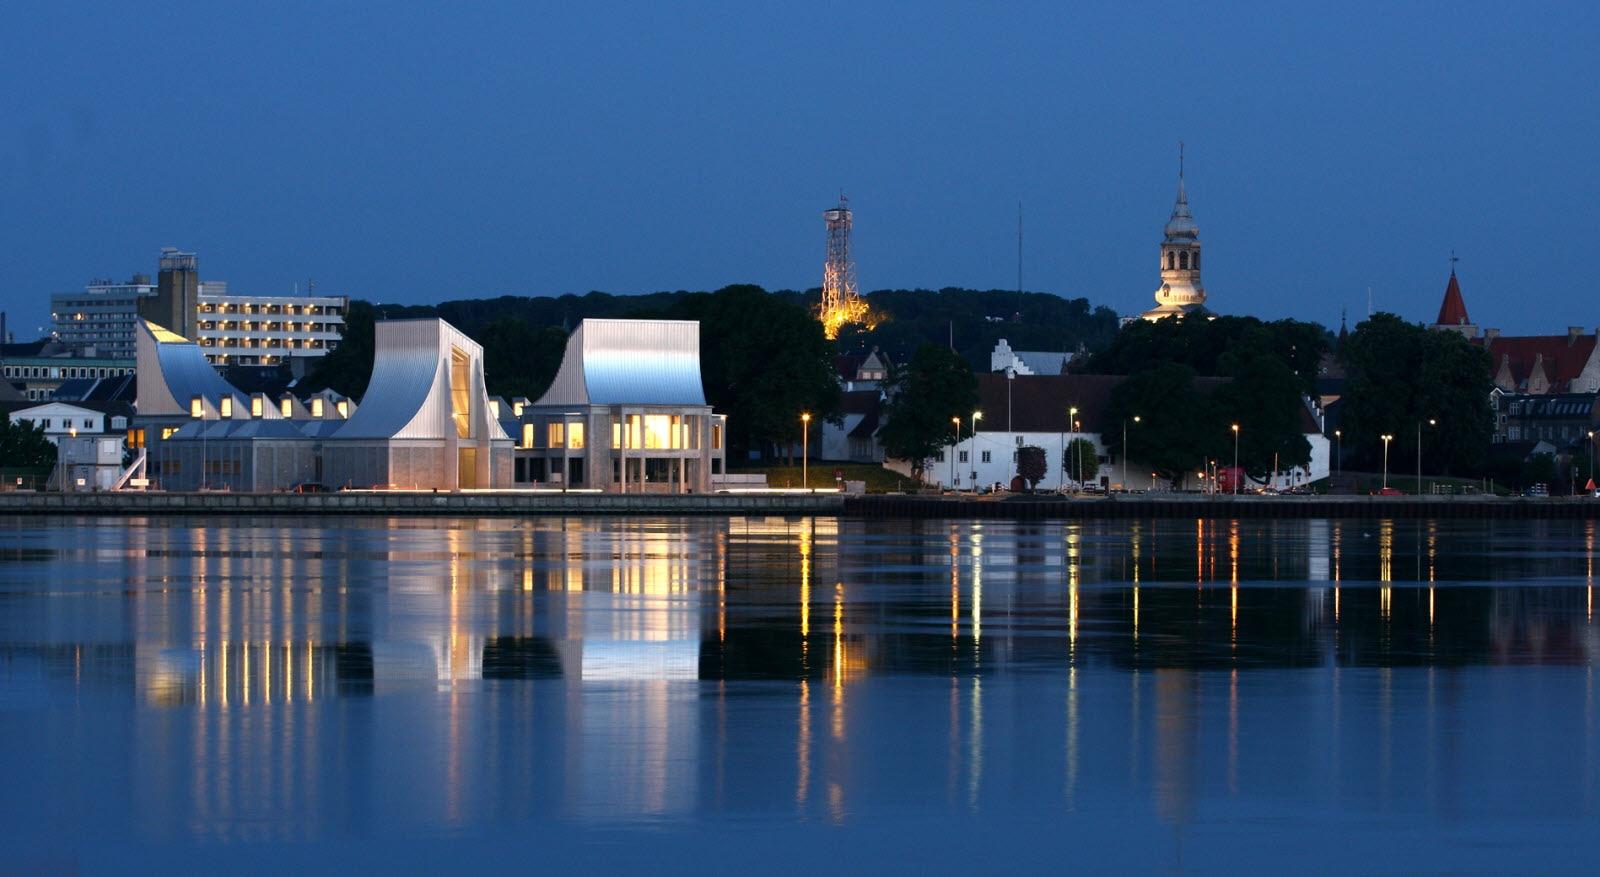 Twitter gade hooker stor tæt på Aalborg